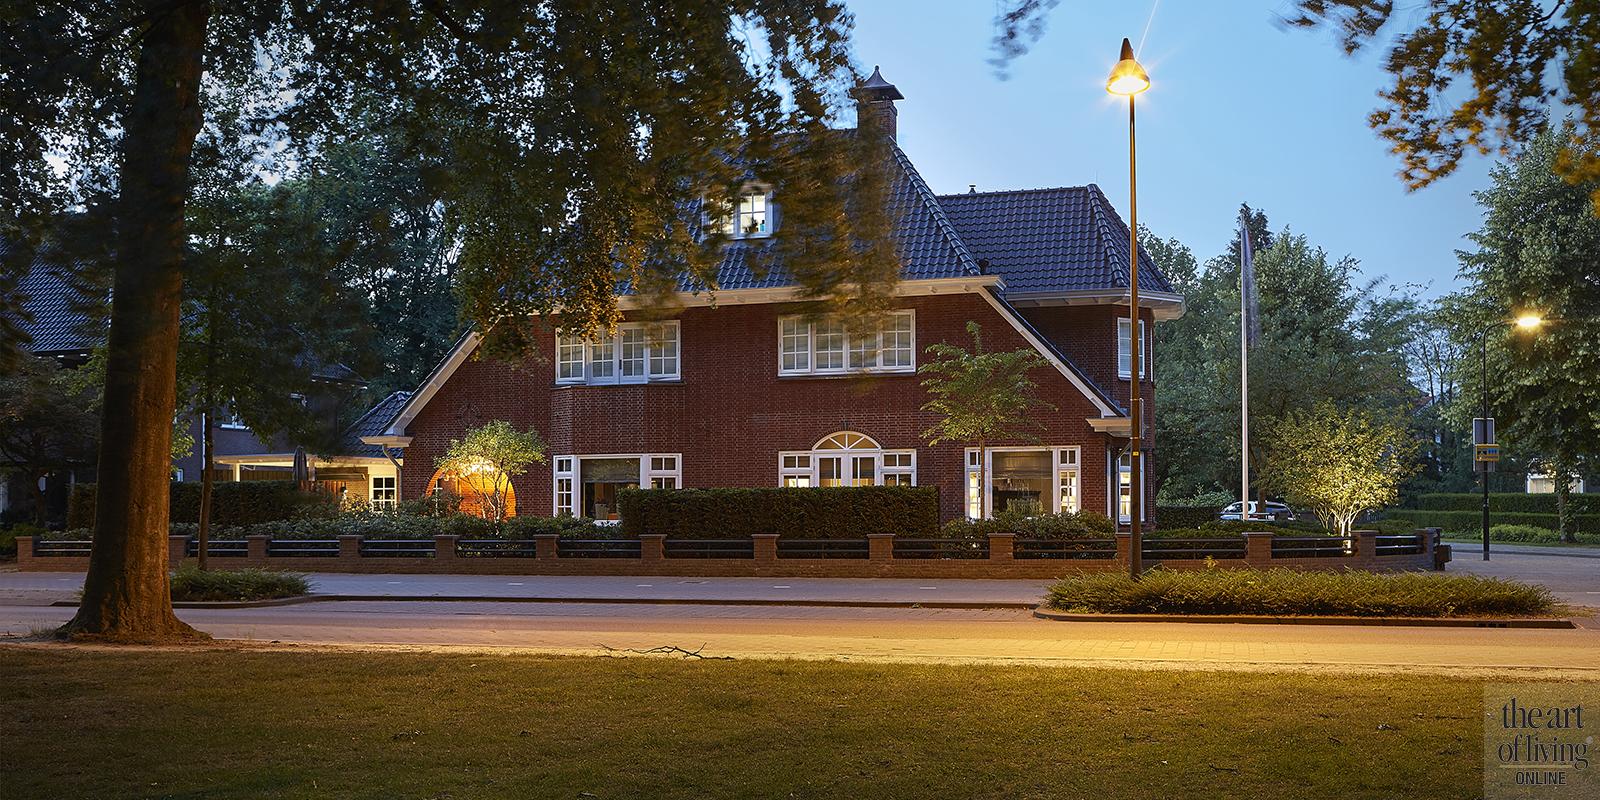 Karakteristieke villa | Biljoengroen tuinarchitect via The Art of Living Online